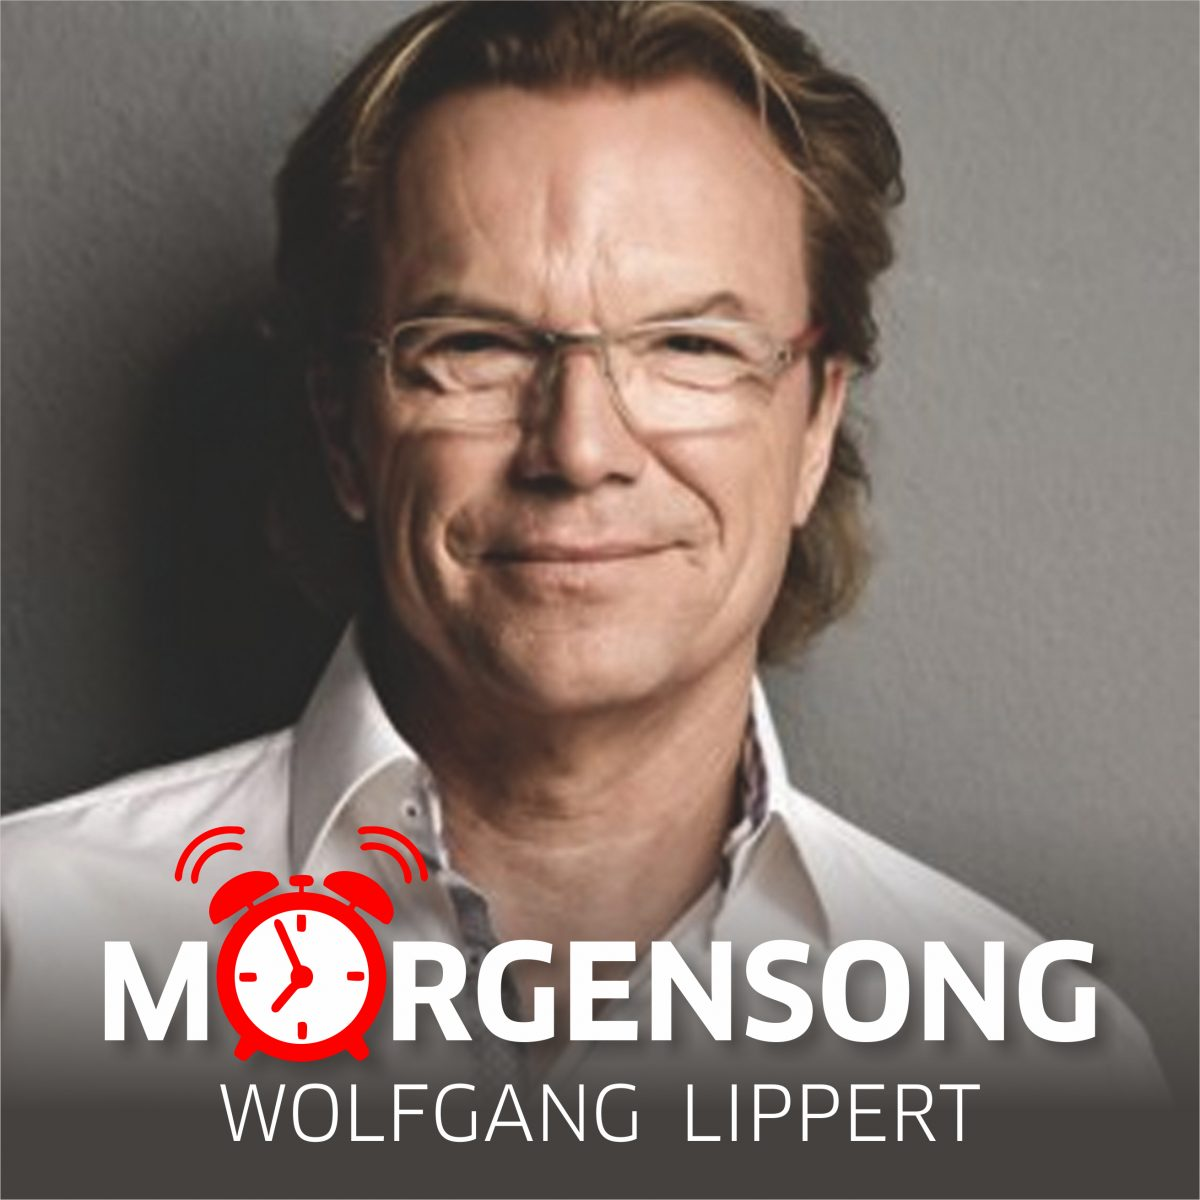 Wolfgang Lippert Gelingt Ihm Mit Dem Morgensong Das Große Comeback